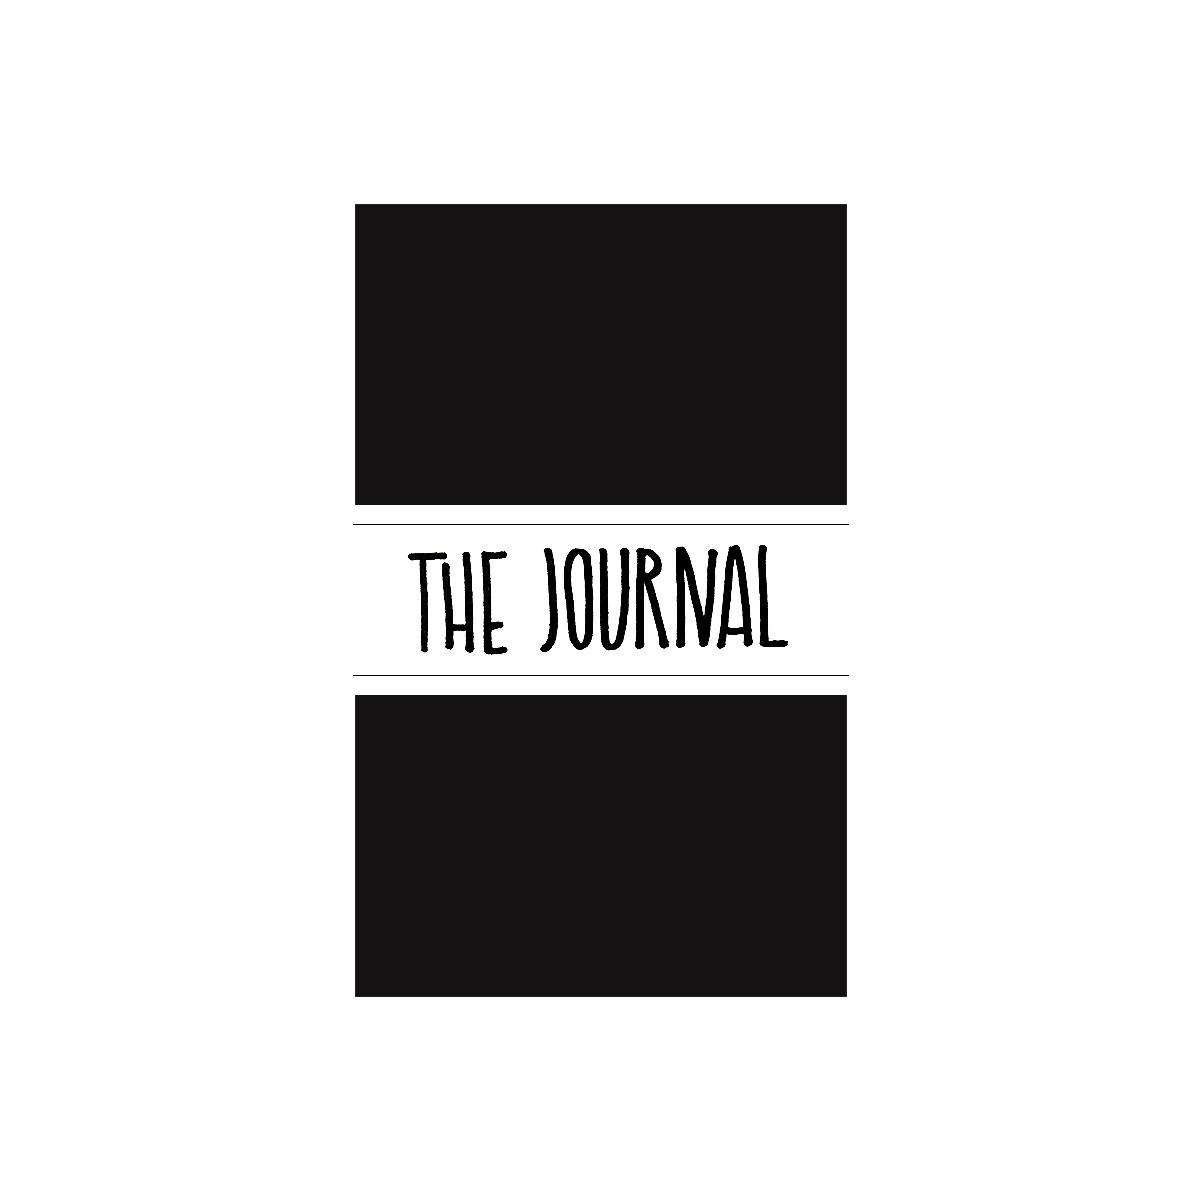 Maxgoodz Ежедневник The Journal Смола, 2 тетради, В5